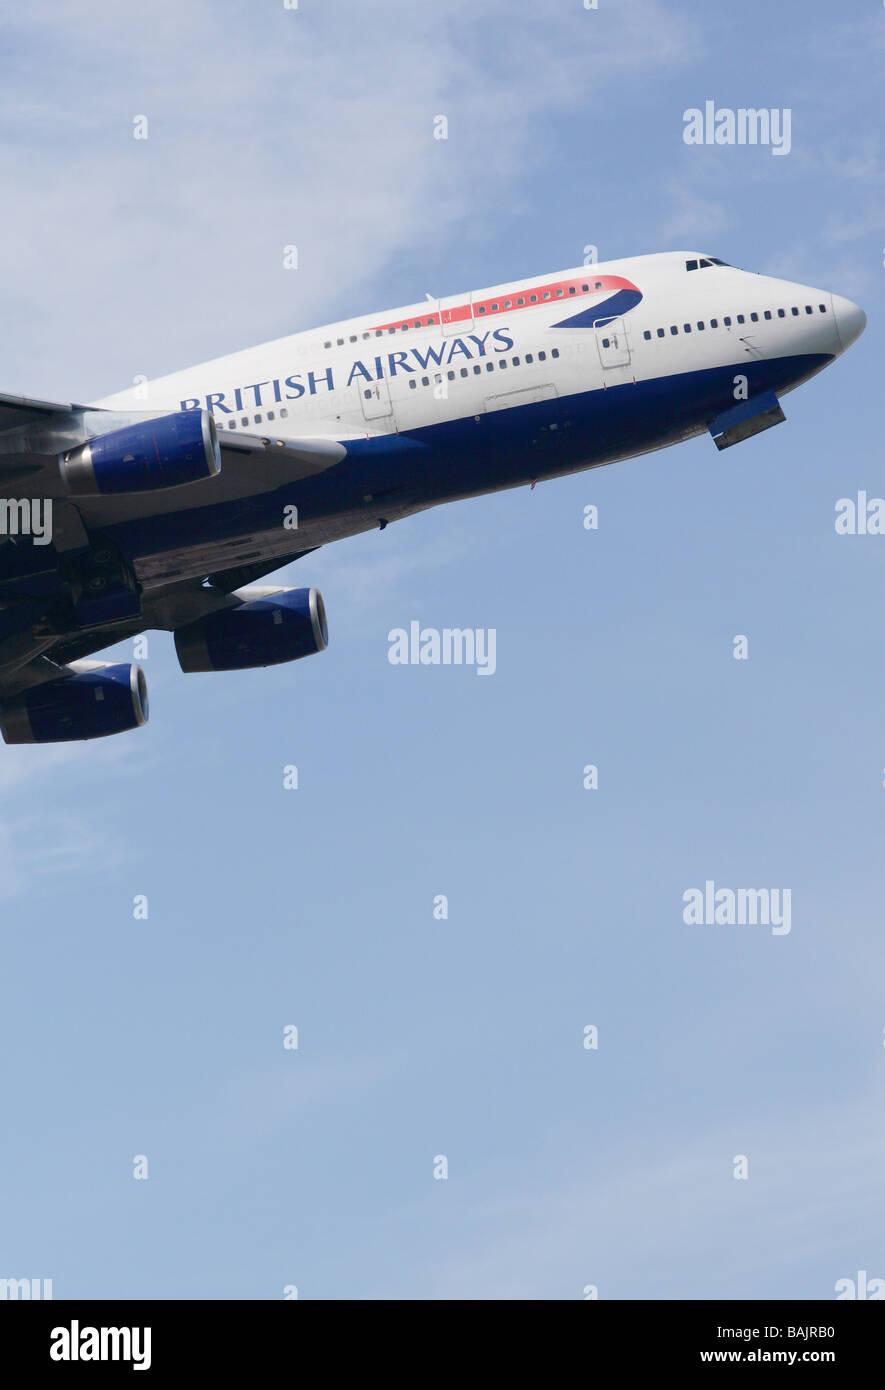 BA British Airways Boeing 747 jumbo jet taking off - Stock Image